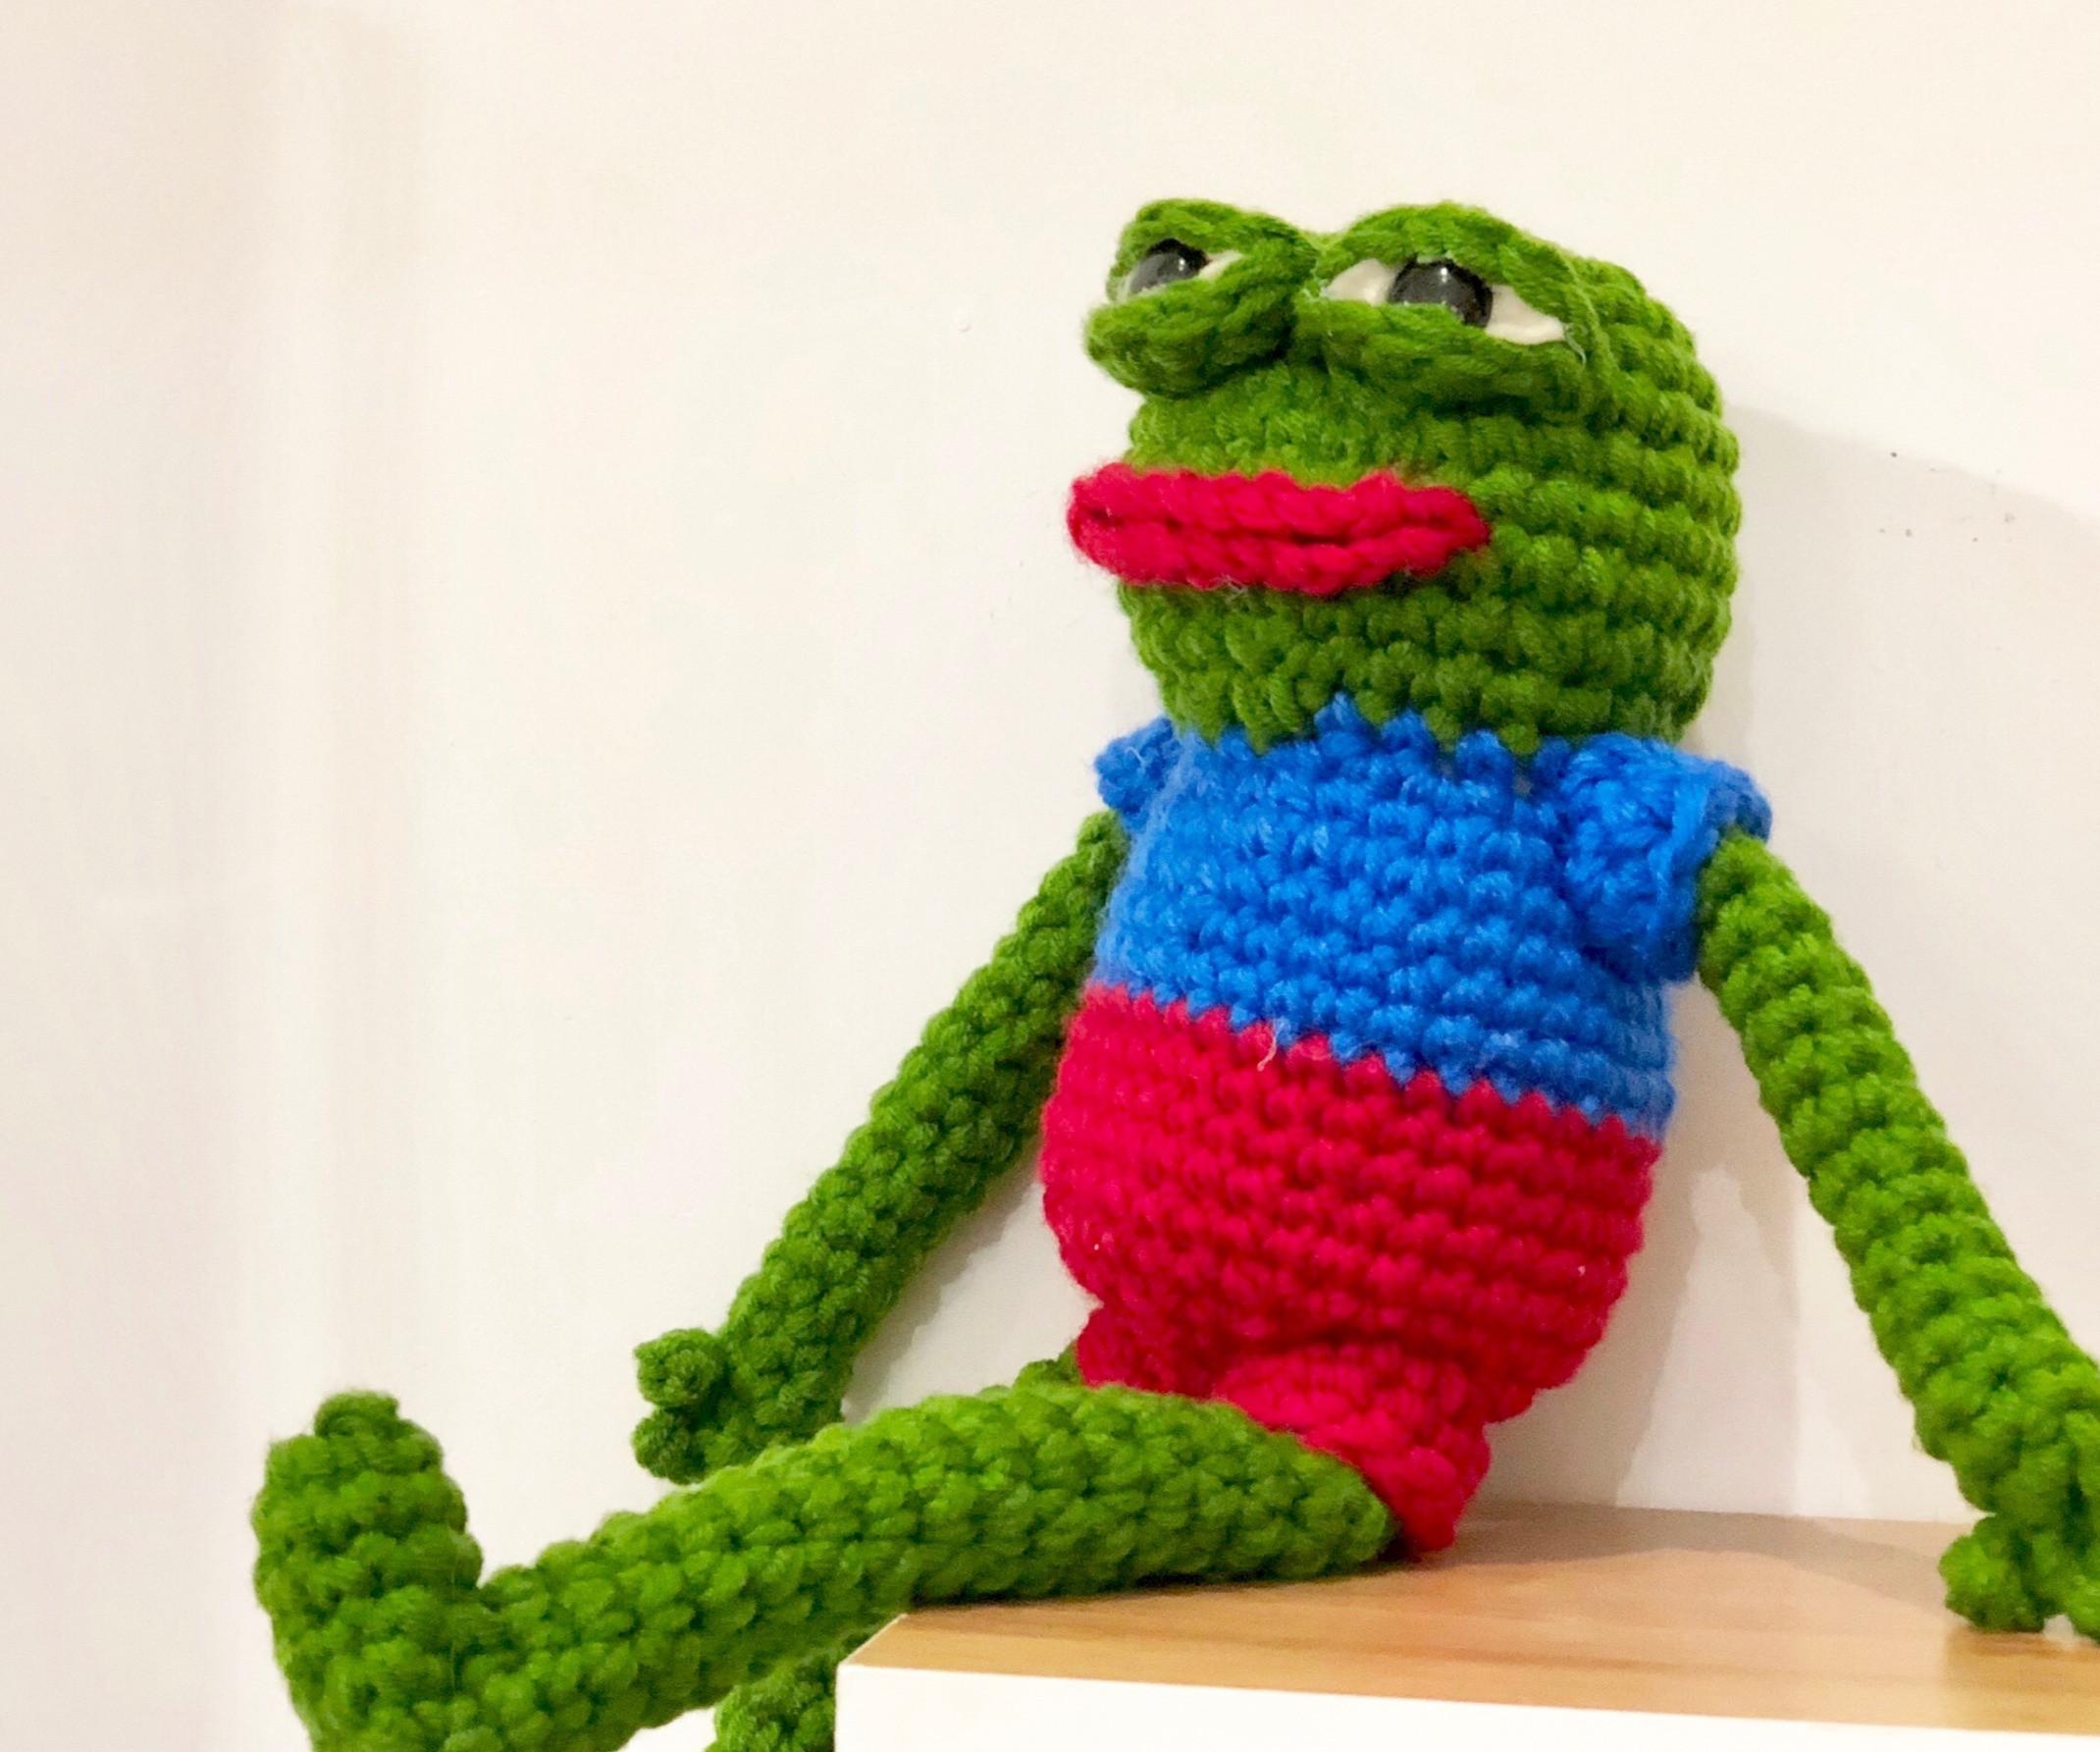 Easy-crochet pepe the frog workshop